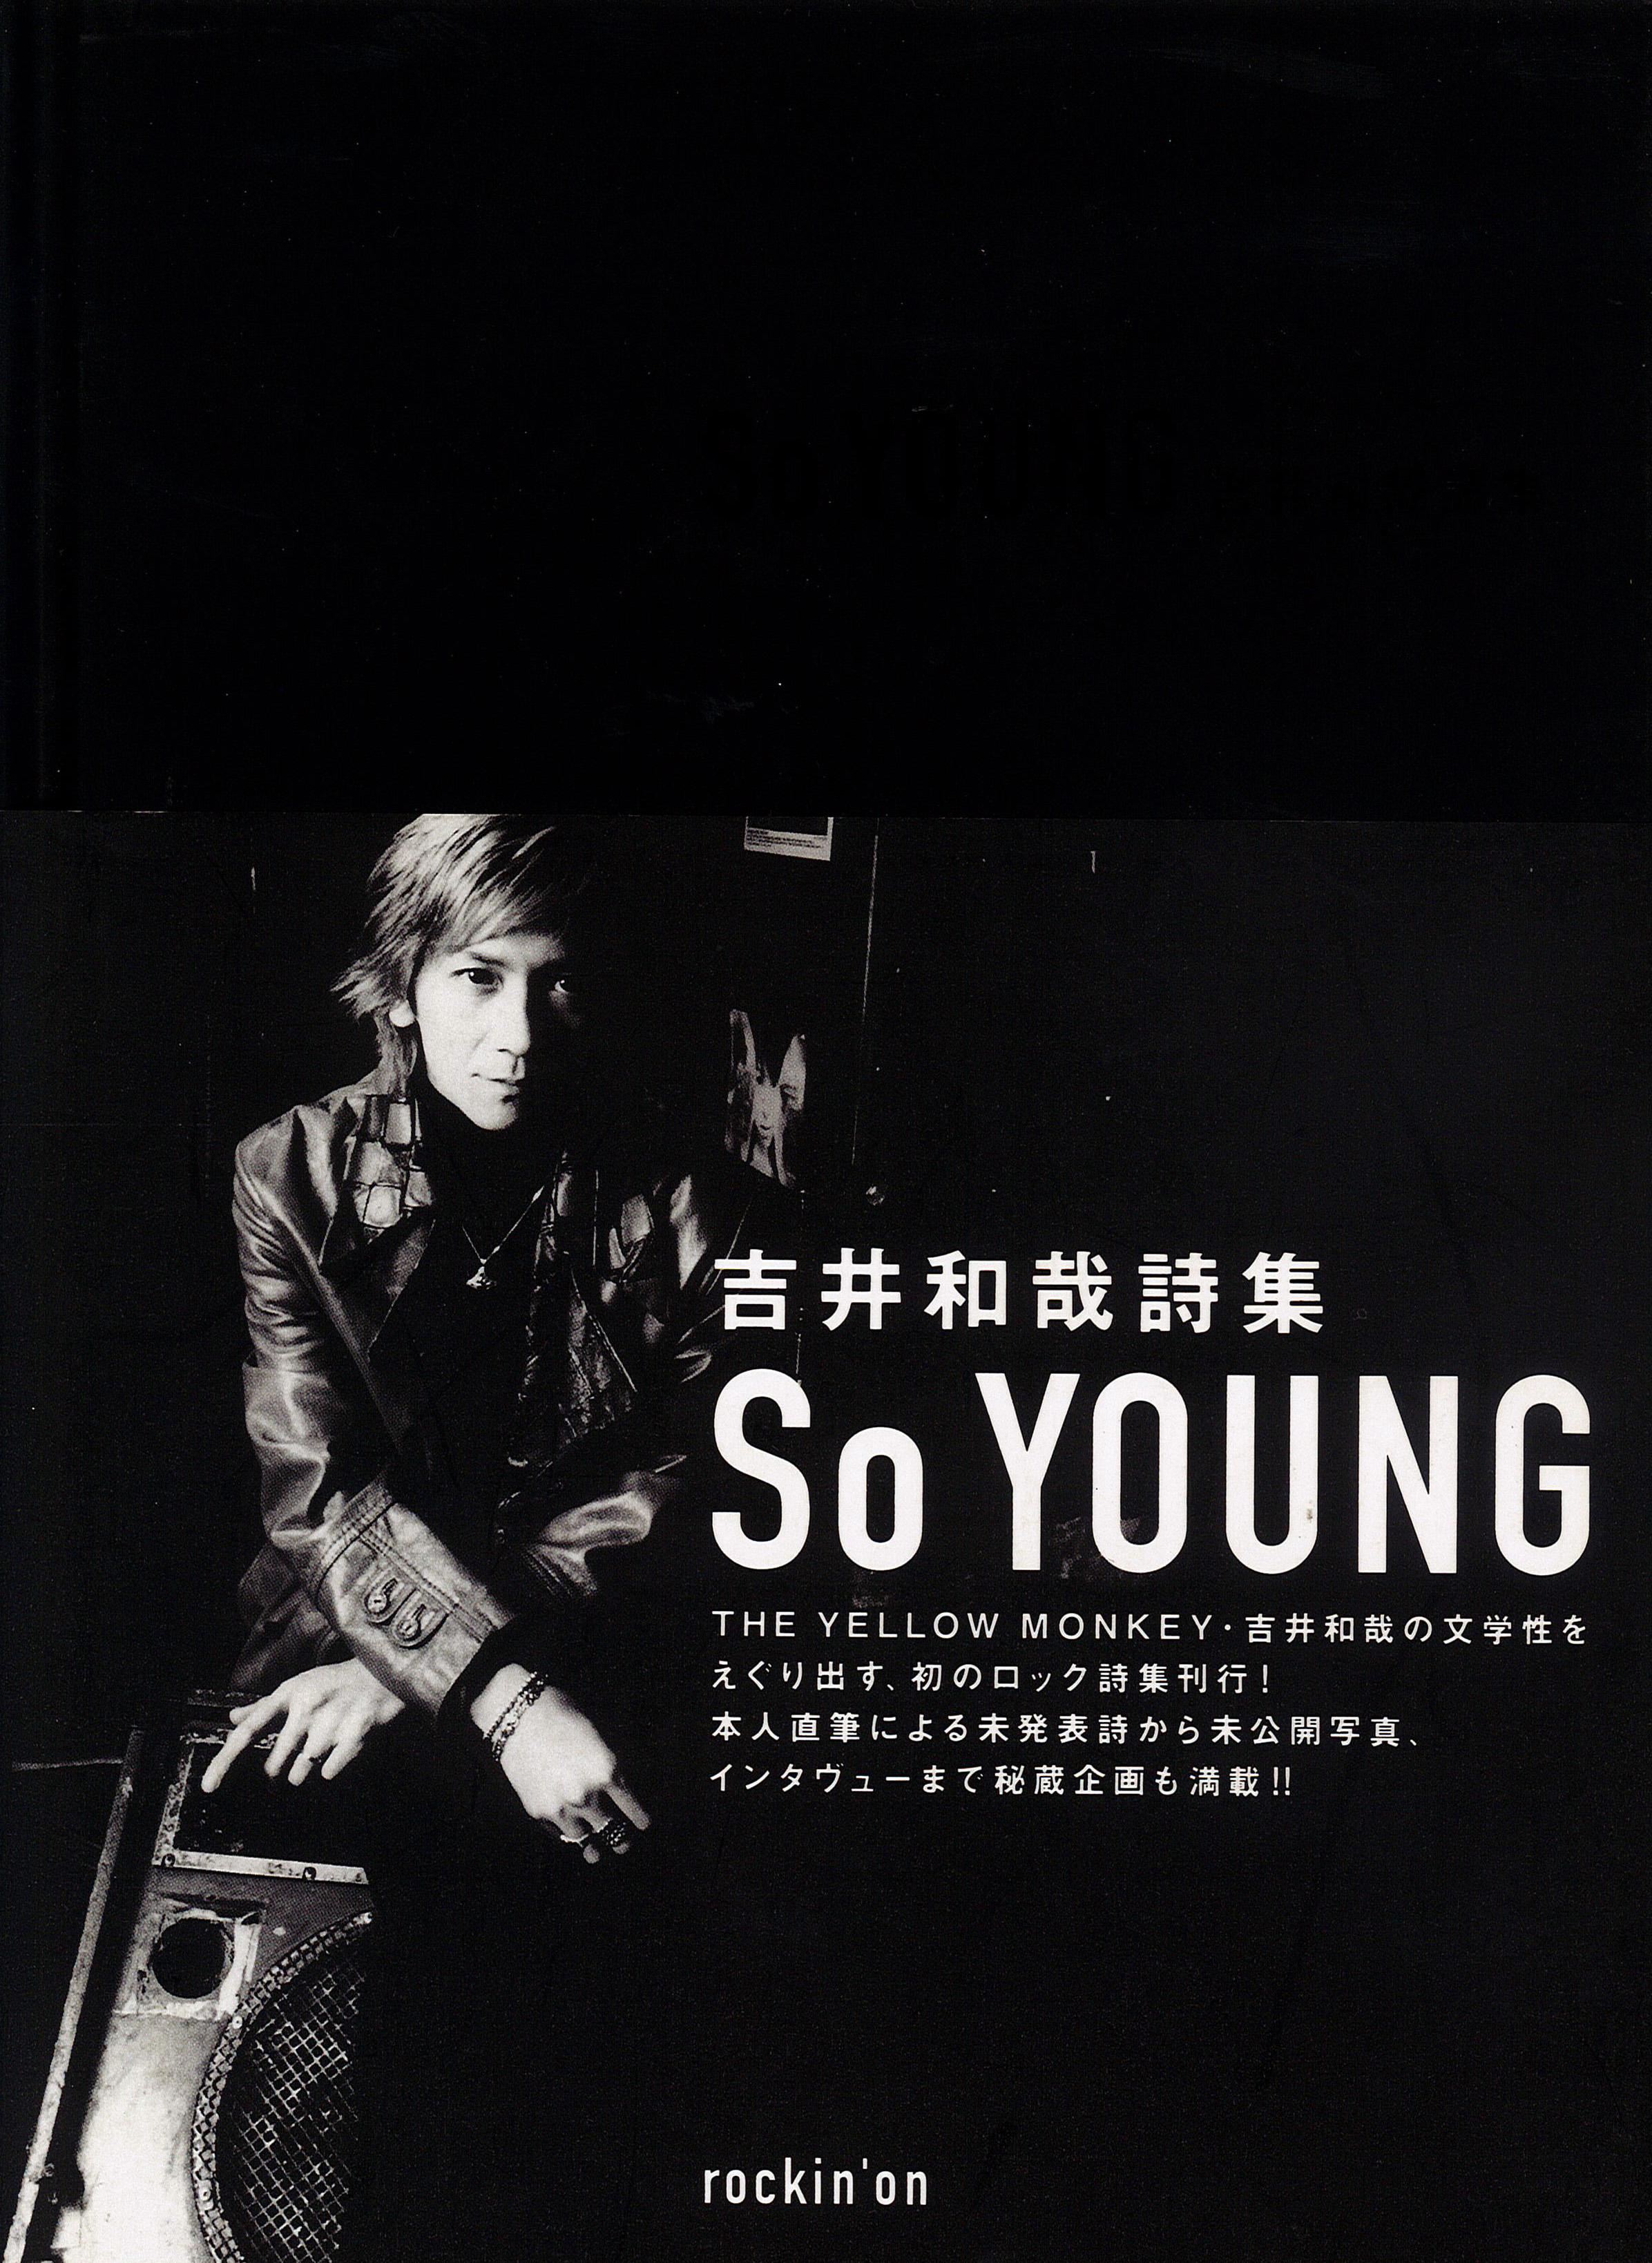 SO YOUNG 吉井和哉詩集